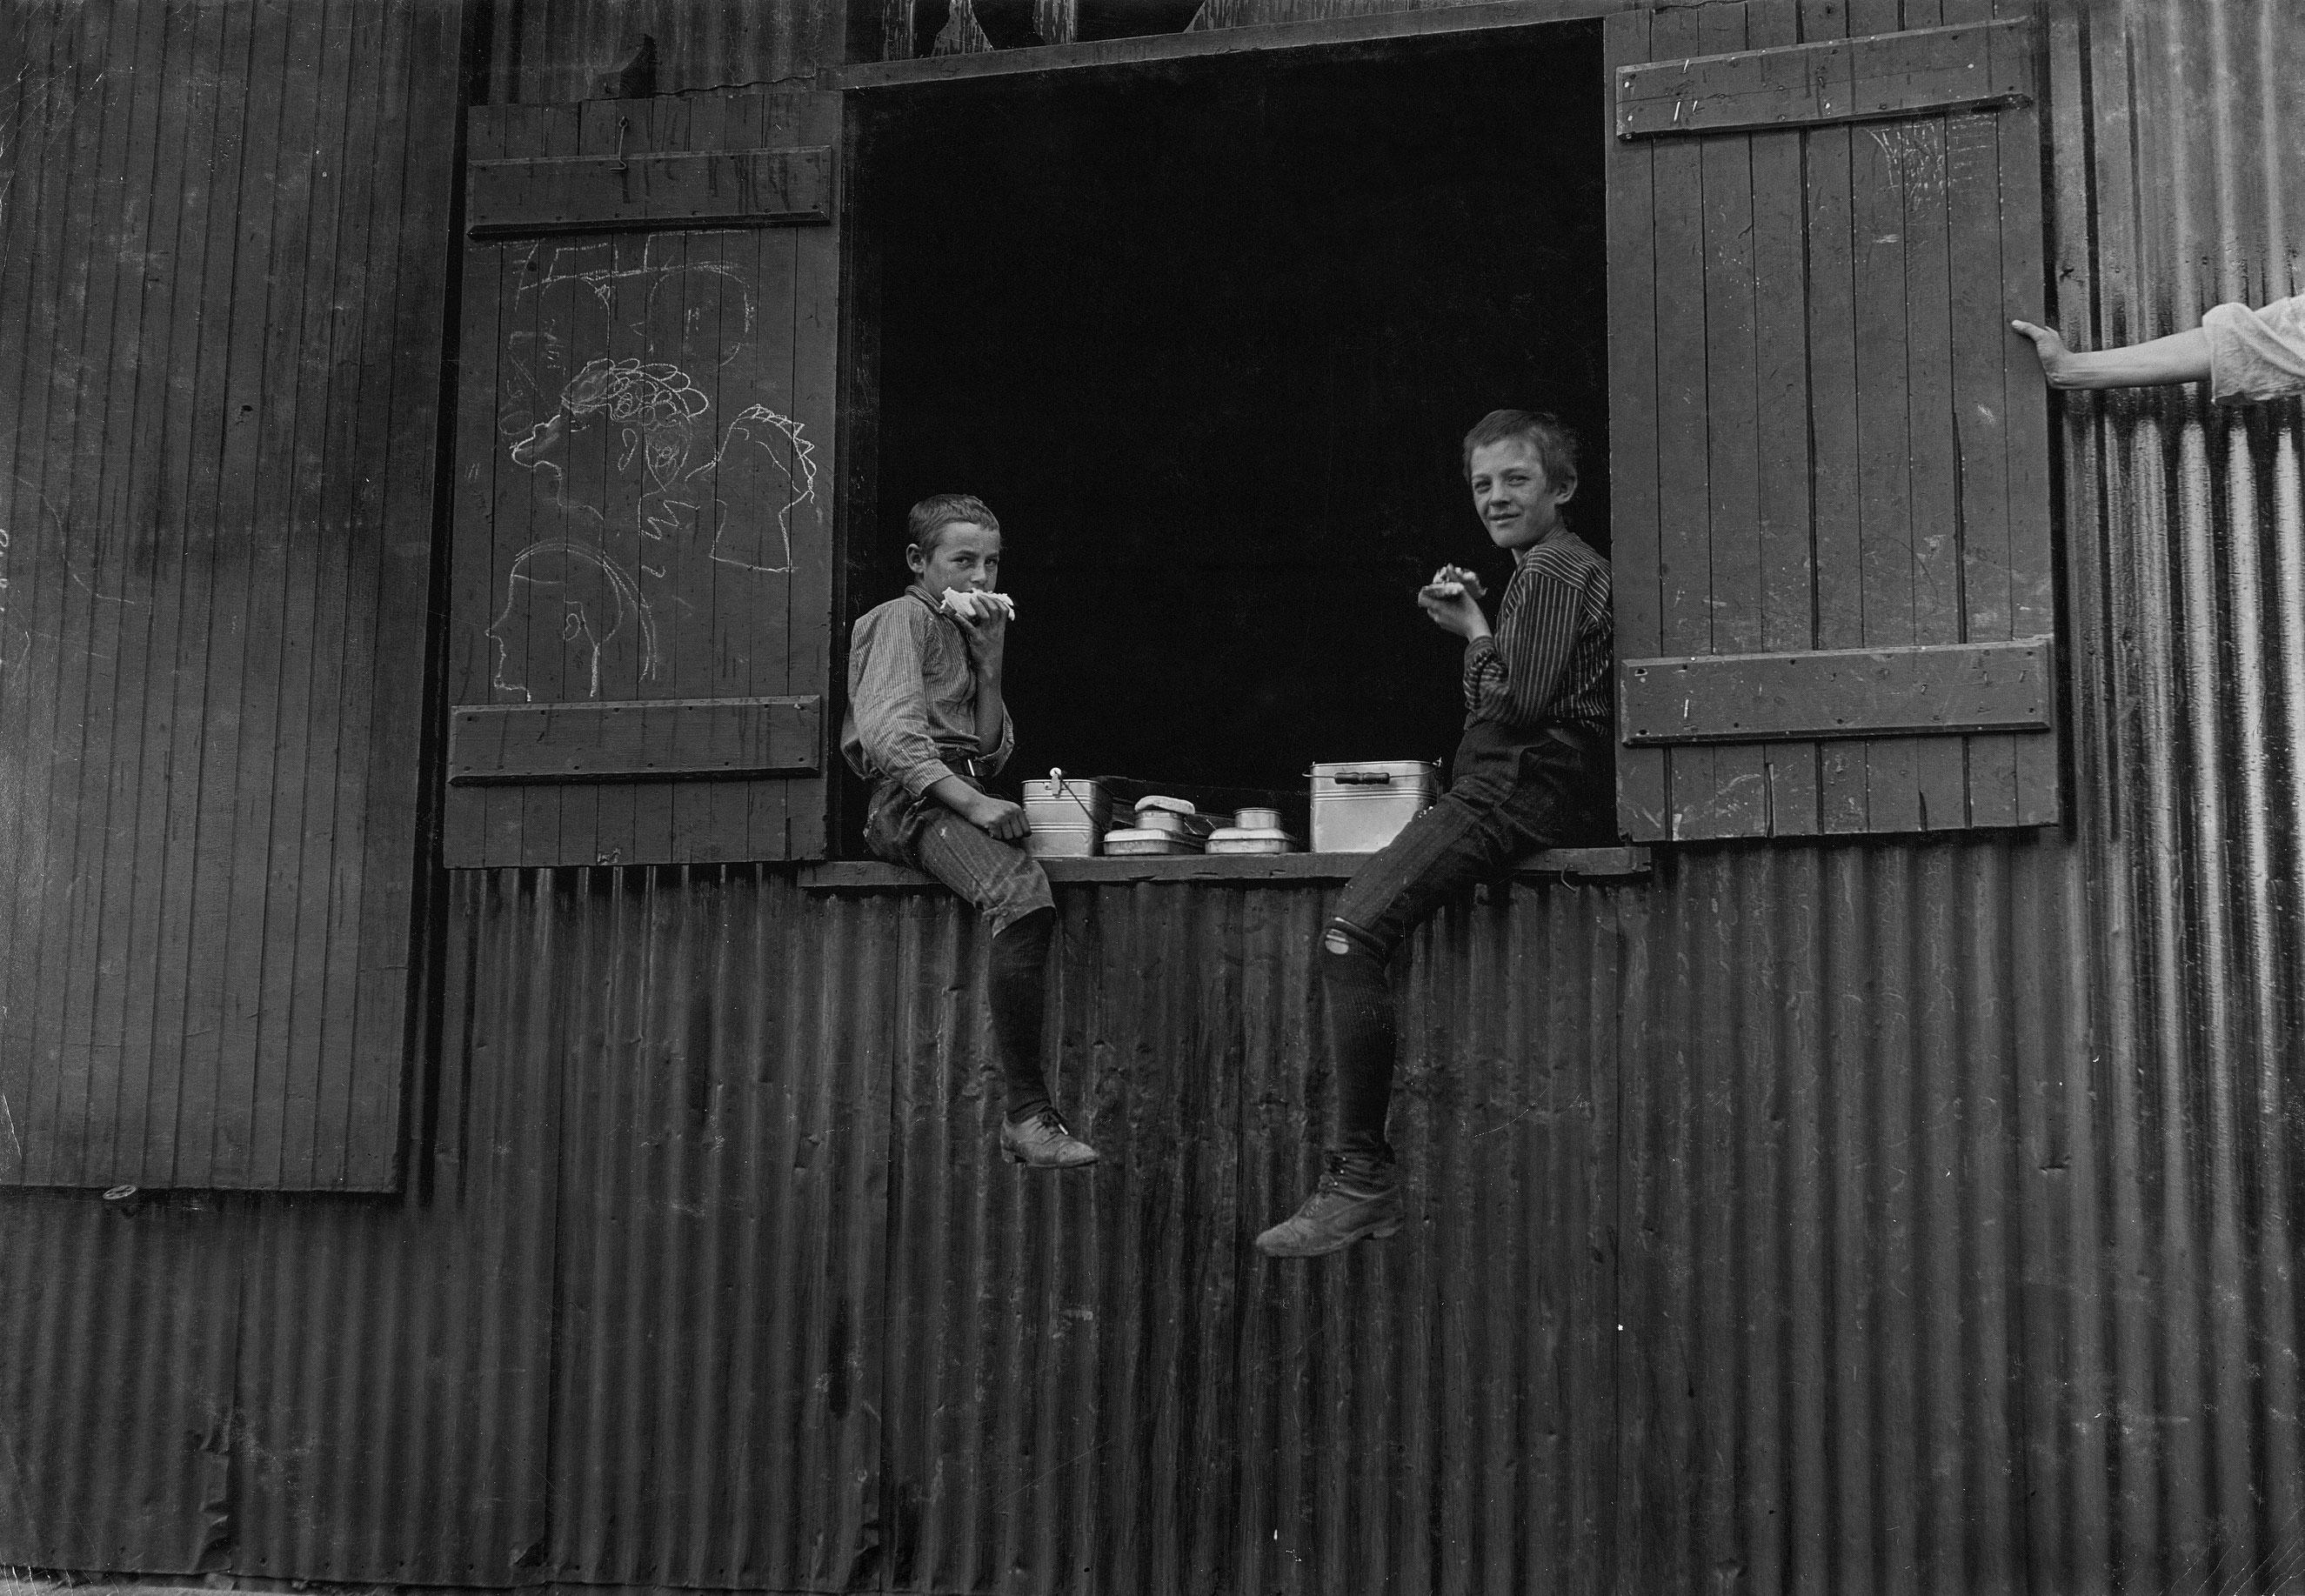 Lunch Time, Economy Glass Works, Morgantown, W. Va. Plenty more like this, inside. Oct. 1908. Morgantown, West Virginia.